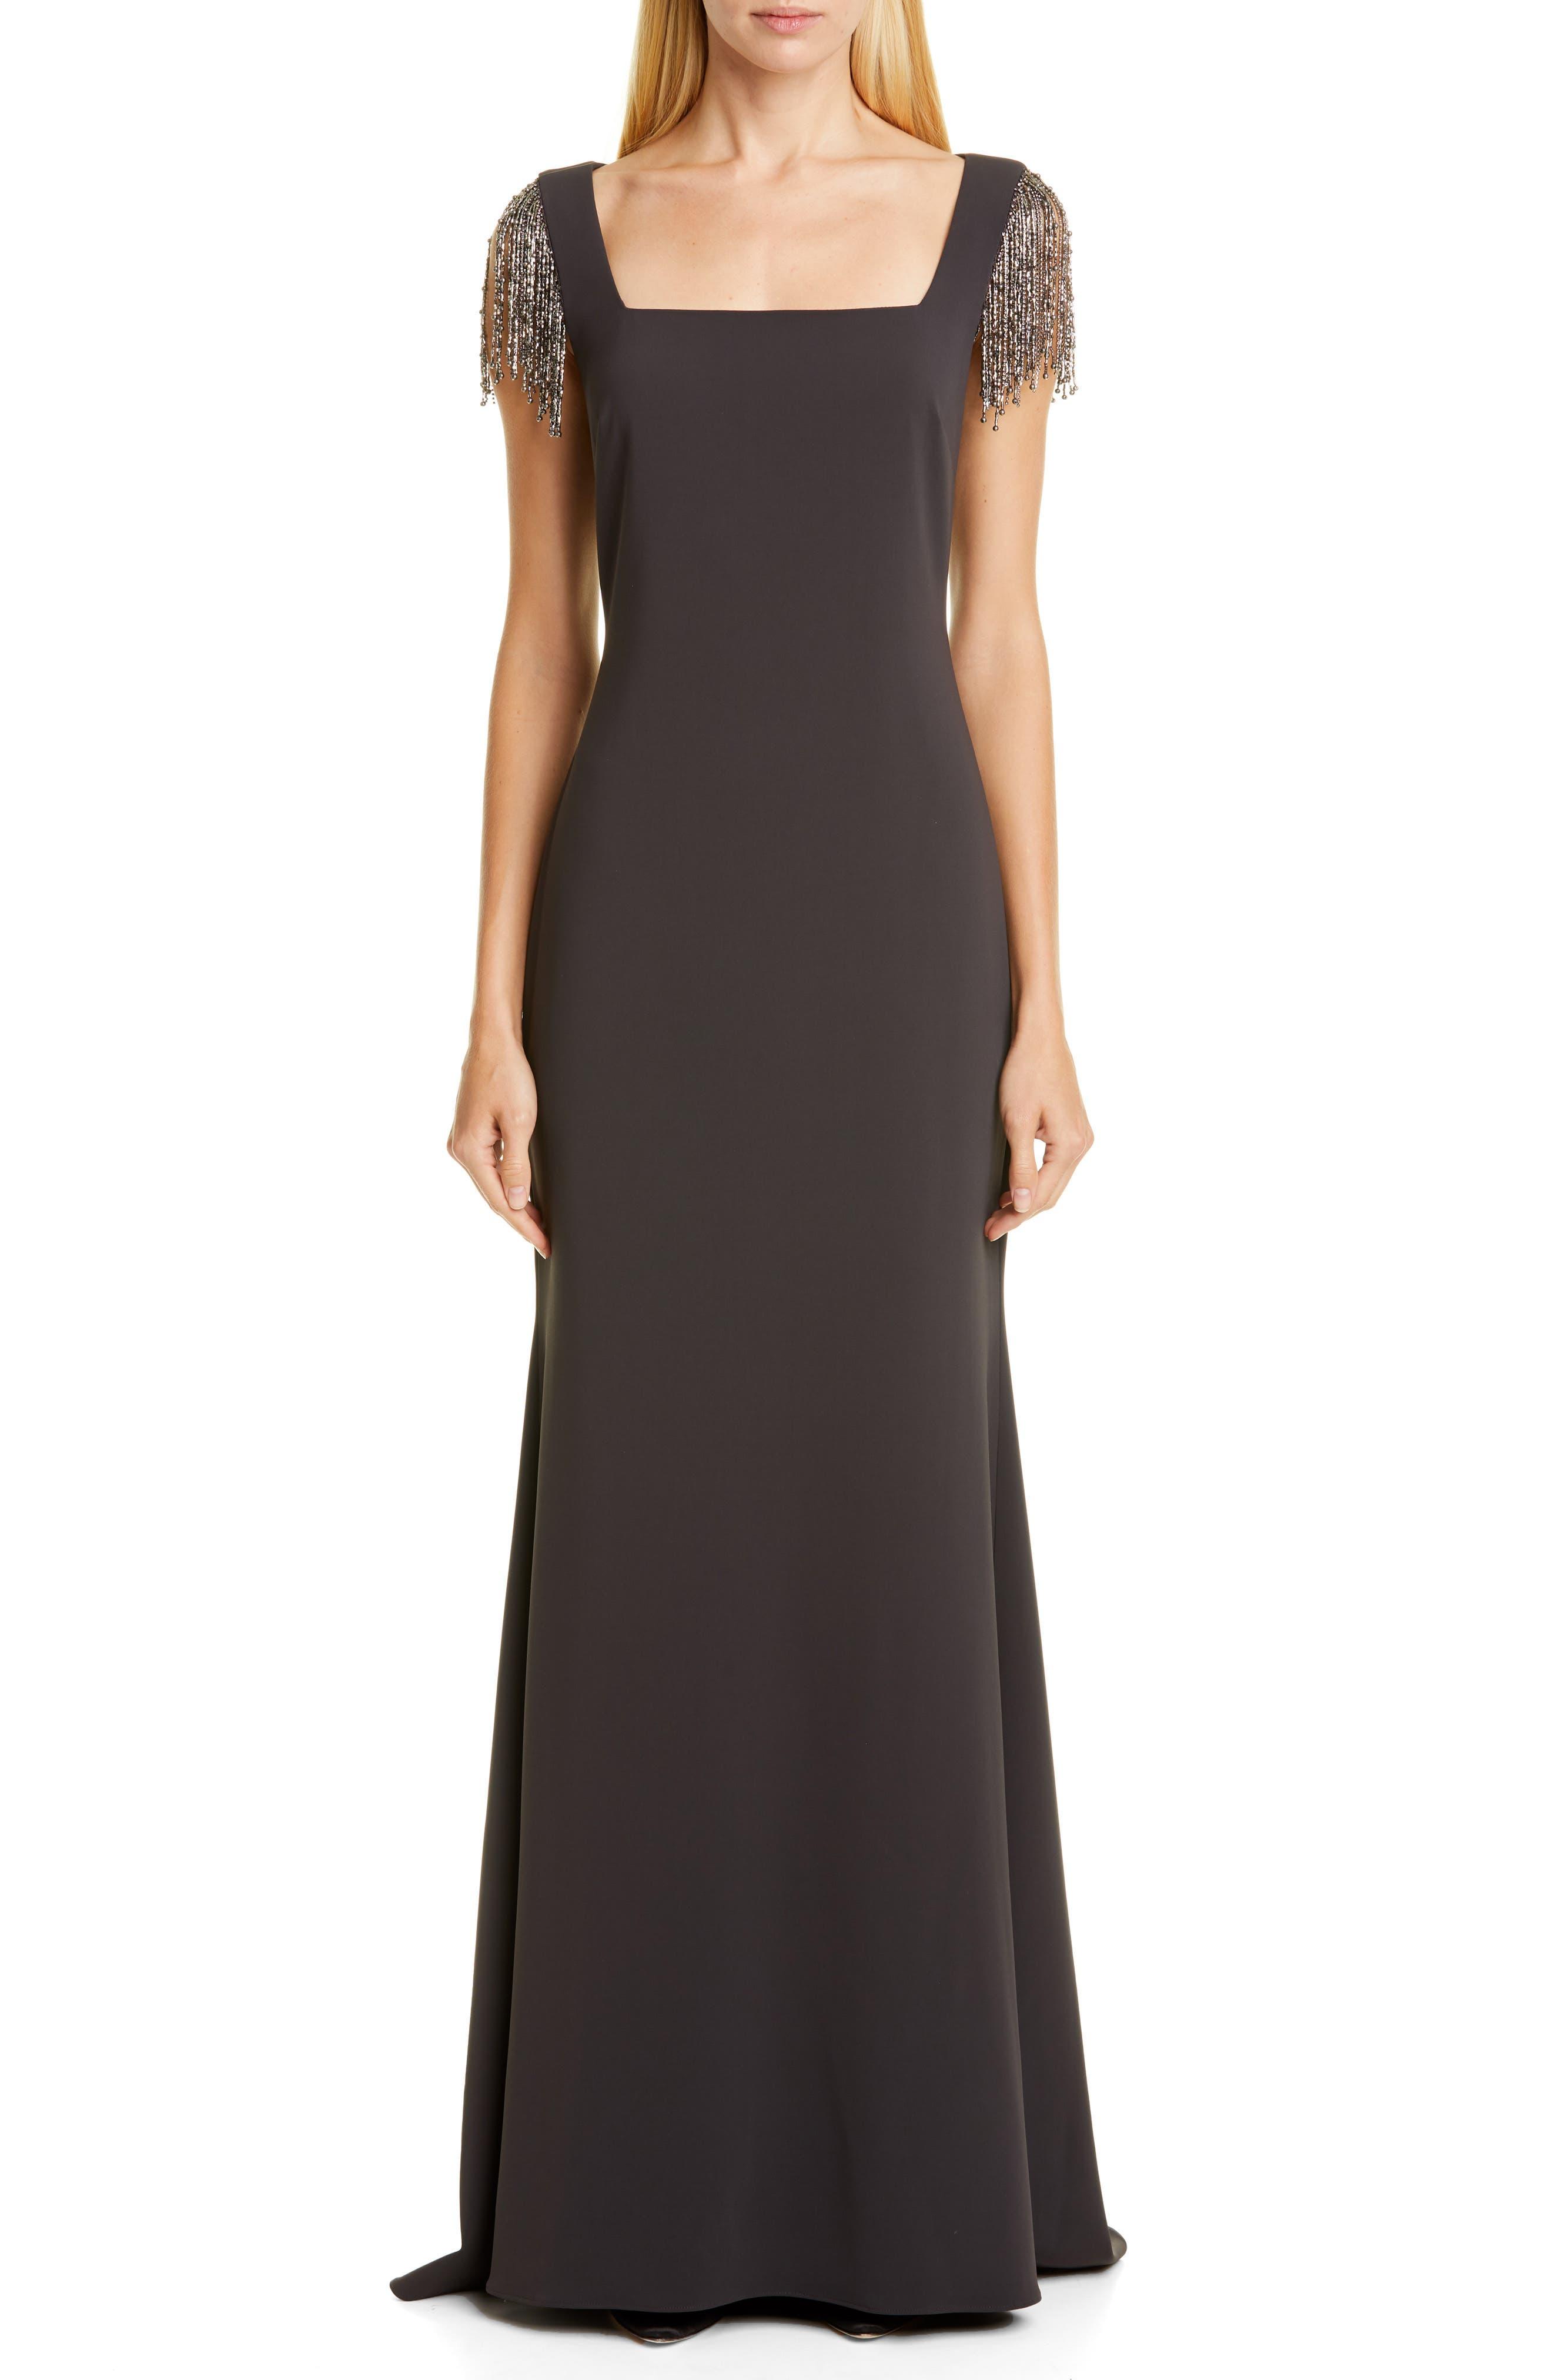 Badgley Mischka Embellished Sleeve Gown, Grey